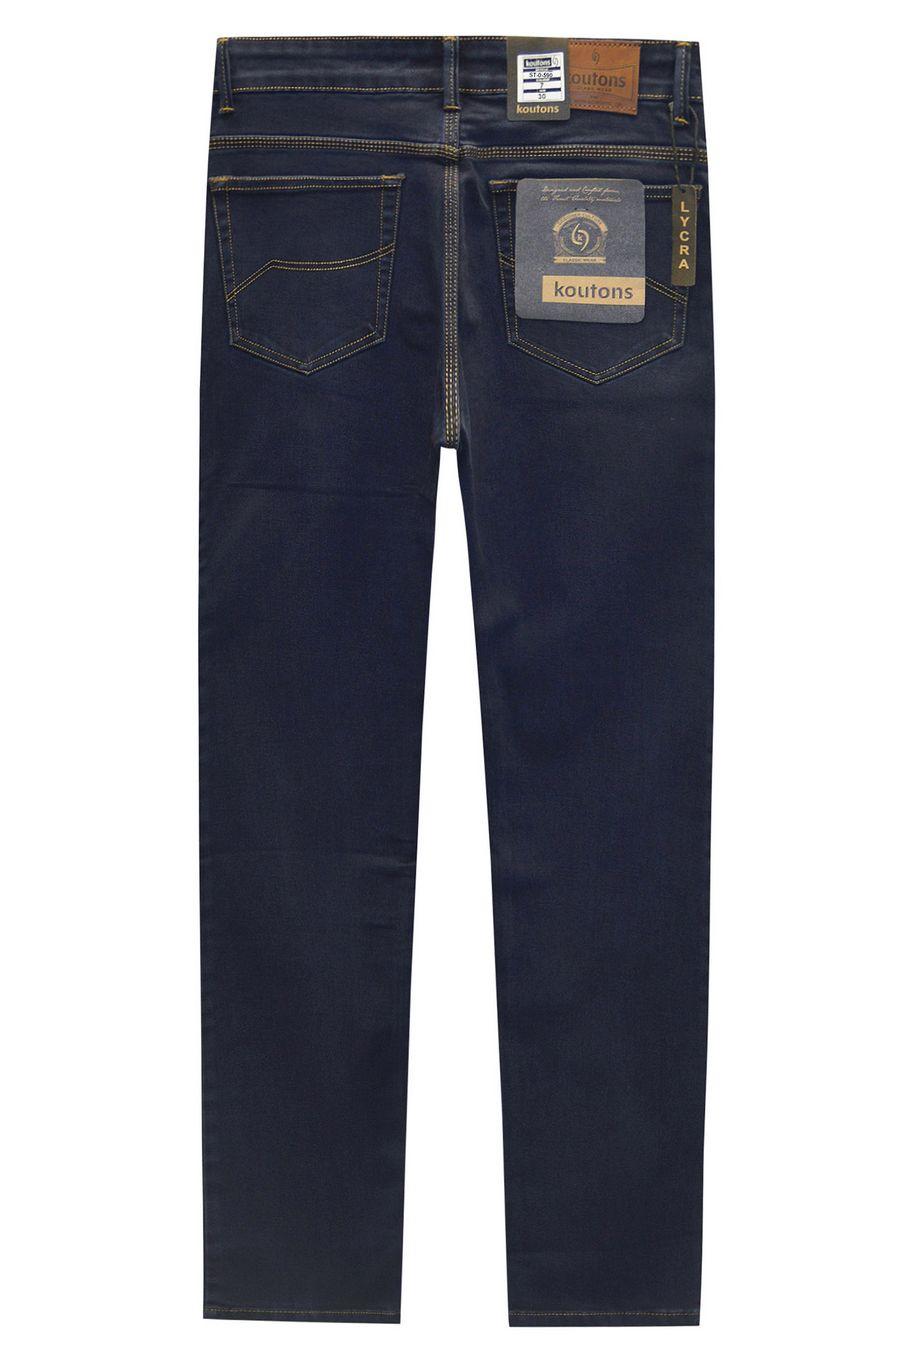 Джинсы мужские Koutons ST-0-590-7 Stretch Black-Blue (31-38) - фото 2